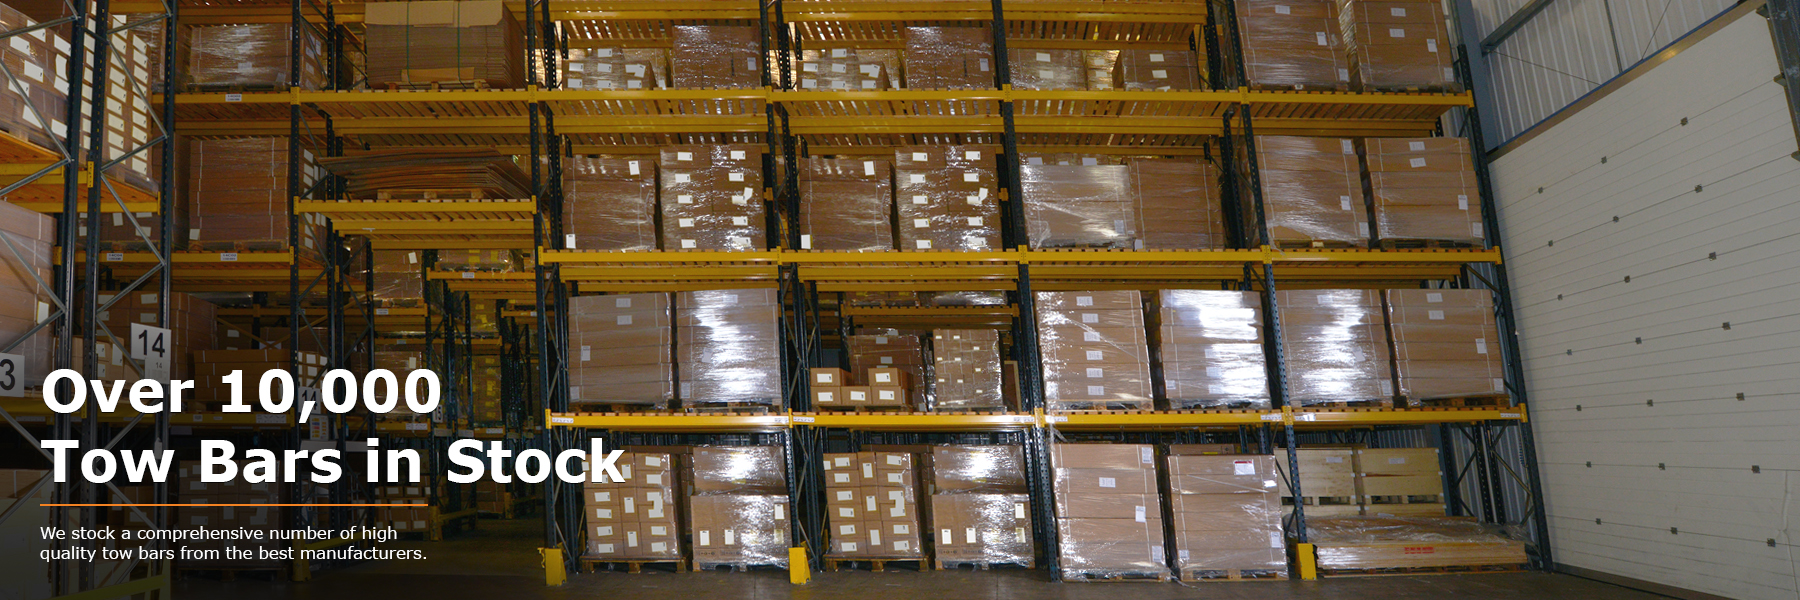 We stock over 10,000 towbars at PF Jones